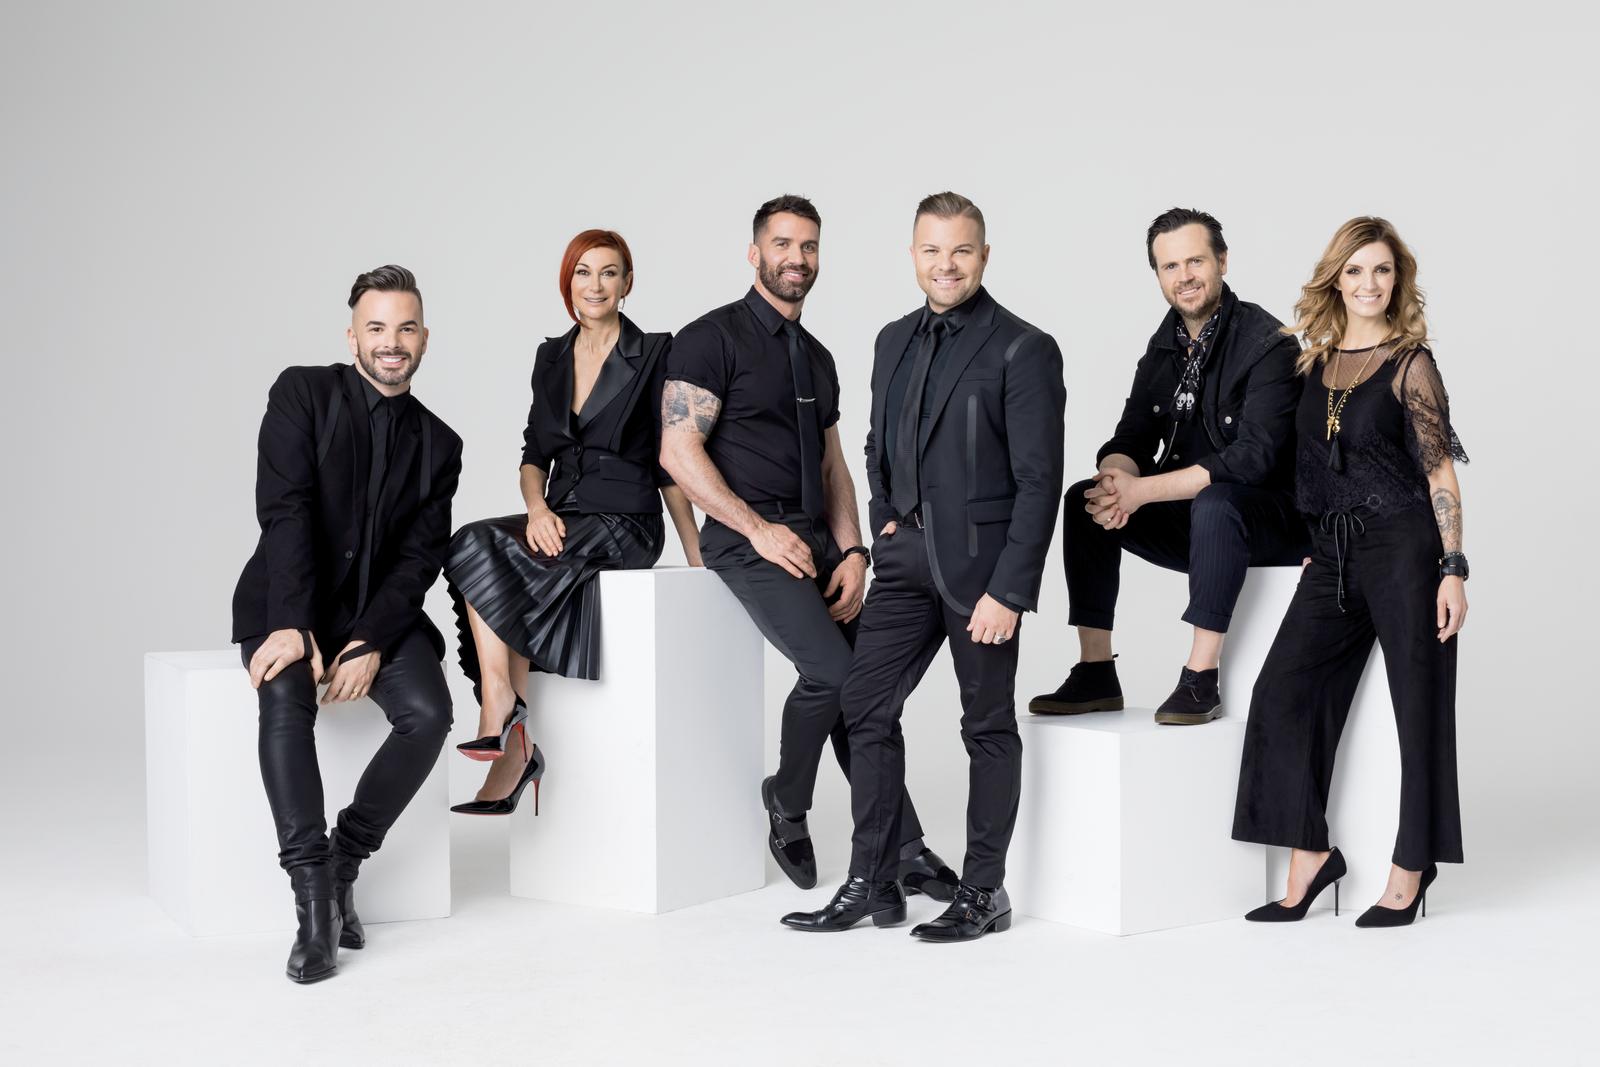 Left to right: ULTA Beauty Pro Team: Sean Godard, Sonya Dove, Ammon Carver, Nick Stenson, Carmody Homan and Danielle Keasling